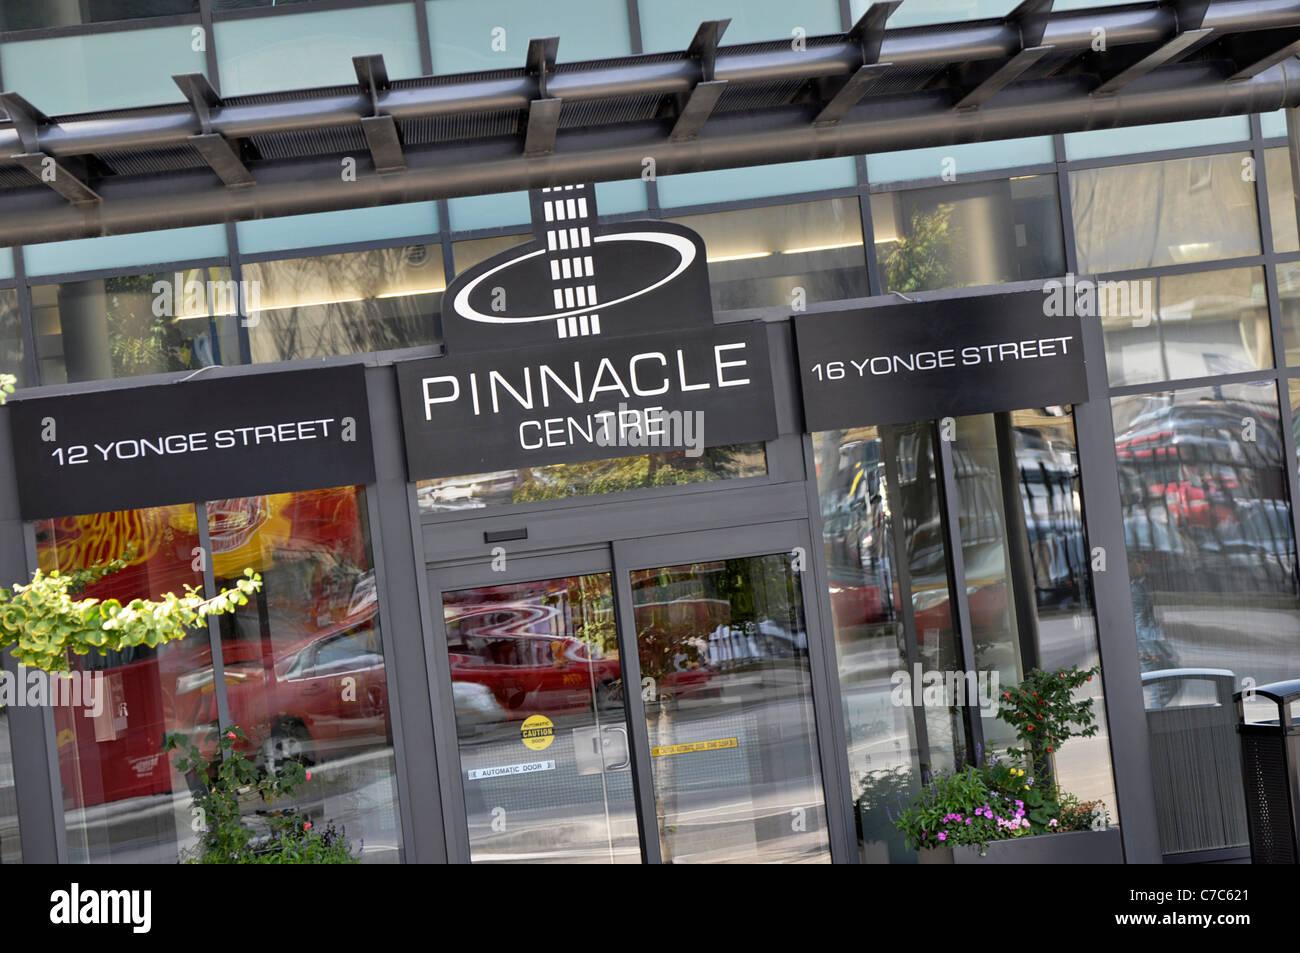 Pinnacle Centre, on Yonge Street, Downtown Toronto - Stock Image